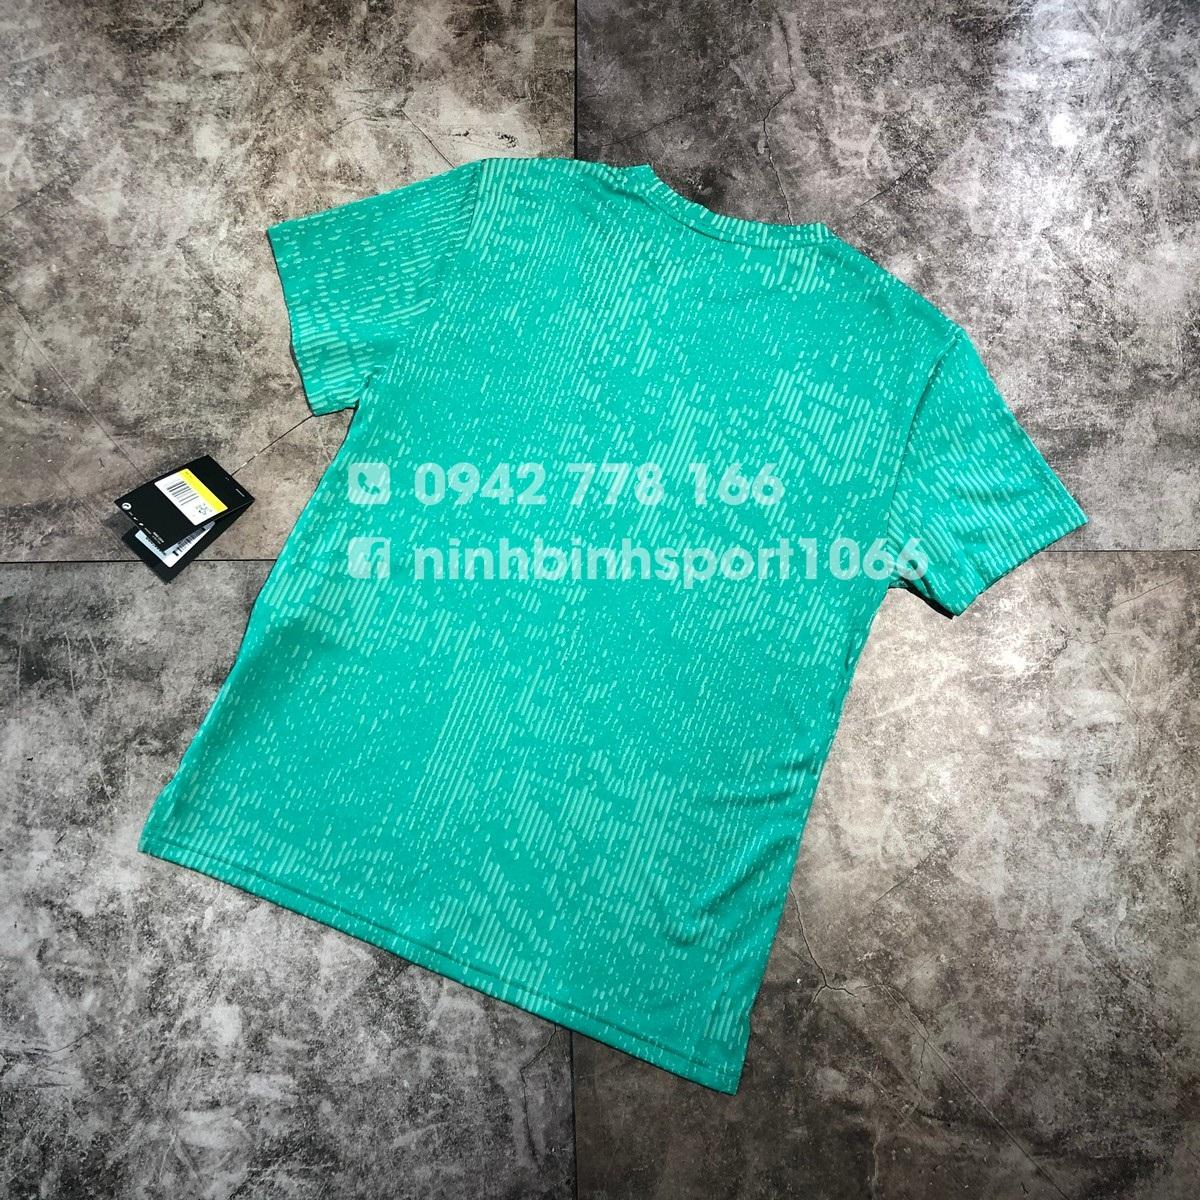 Áo thể thao nam Nike Superset CJ4636-370